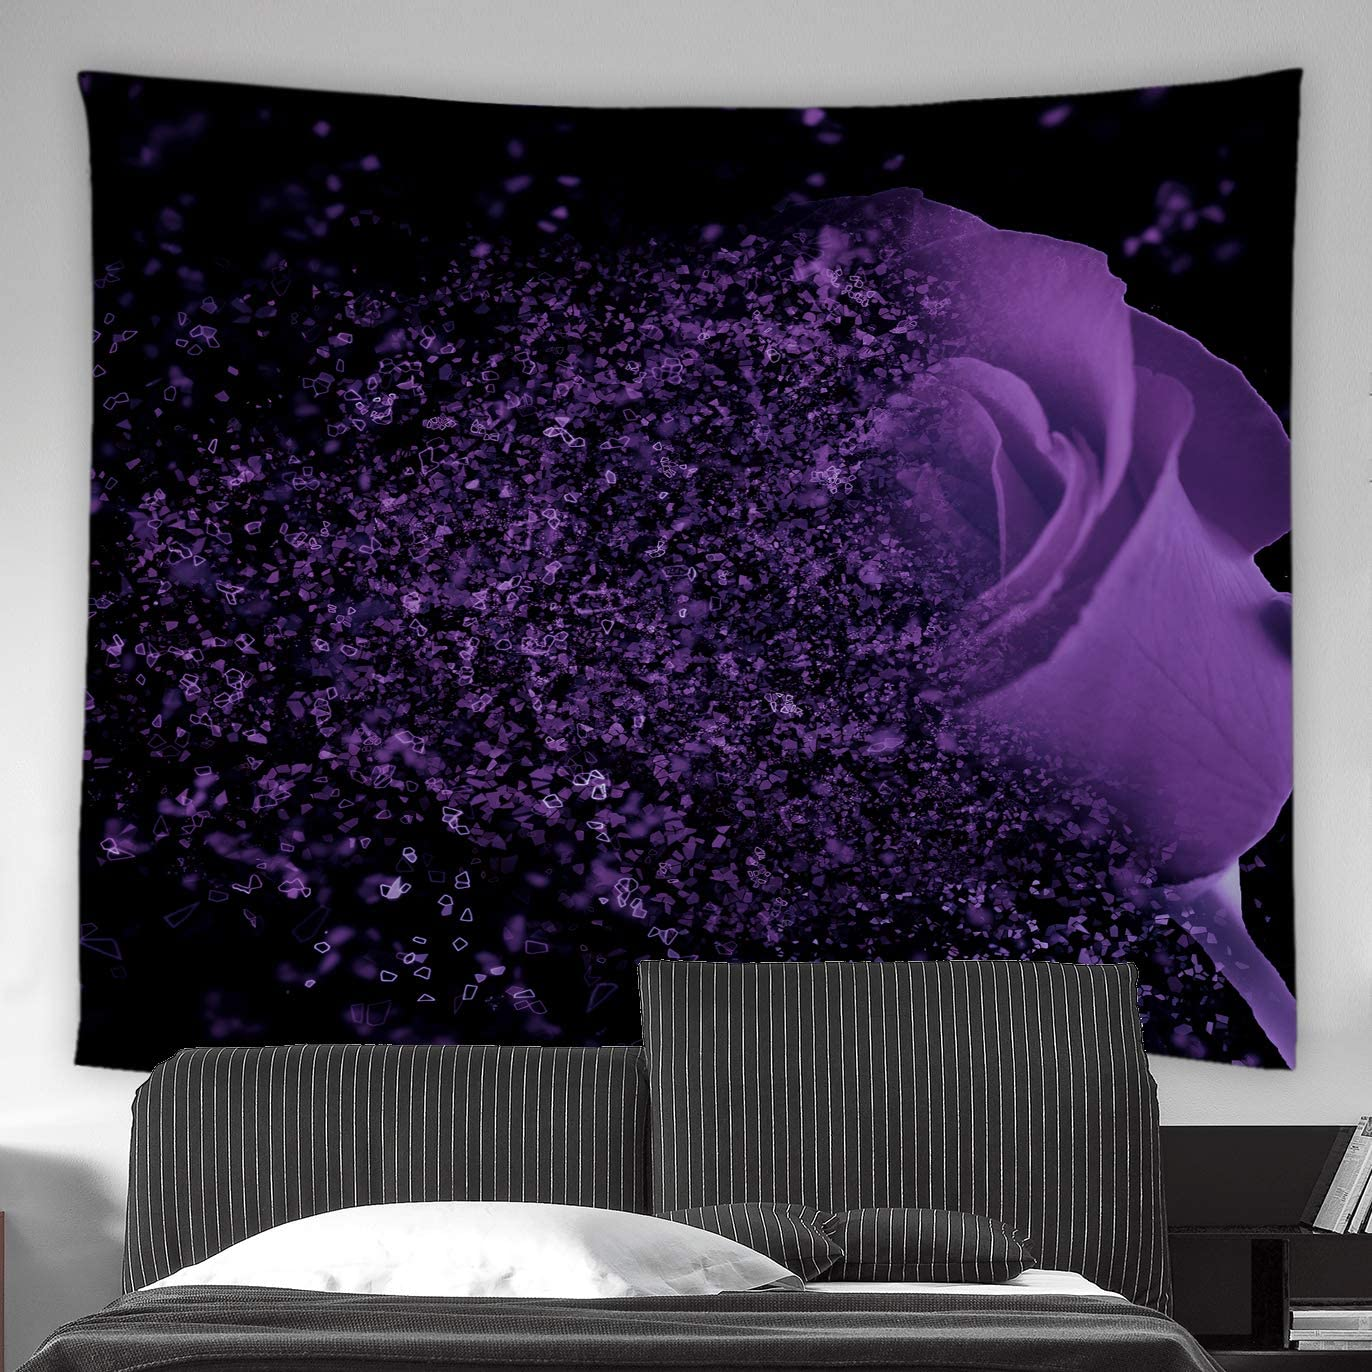 AMFD Flower Tapestry Purple Rose Fantasy Dream Flower Magic Glamorous Black Background Home Decor Wall Hanging Art for Living Room Bedroom Dorm 90x71 Inch